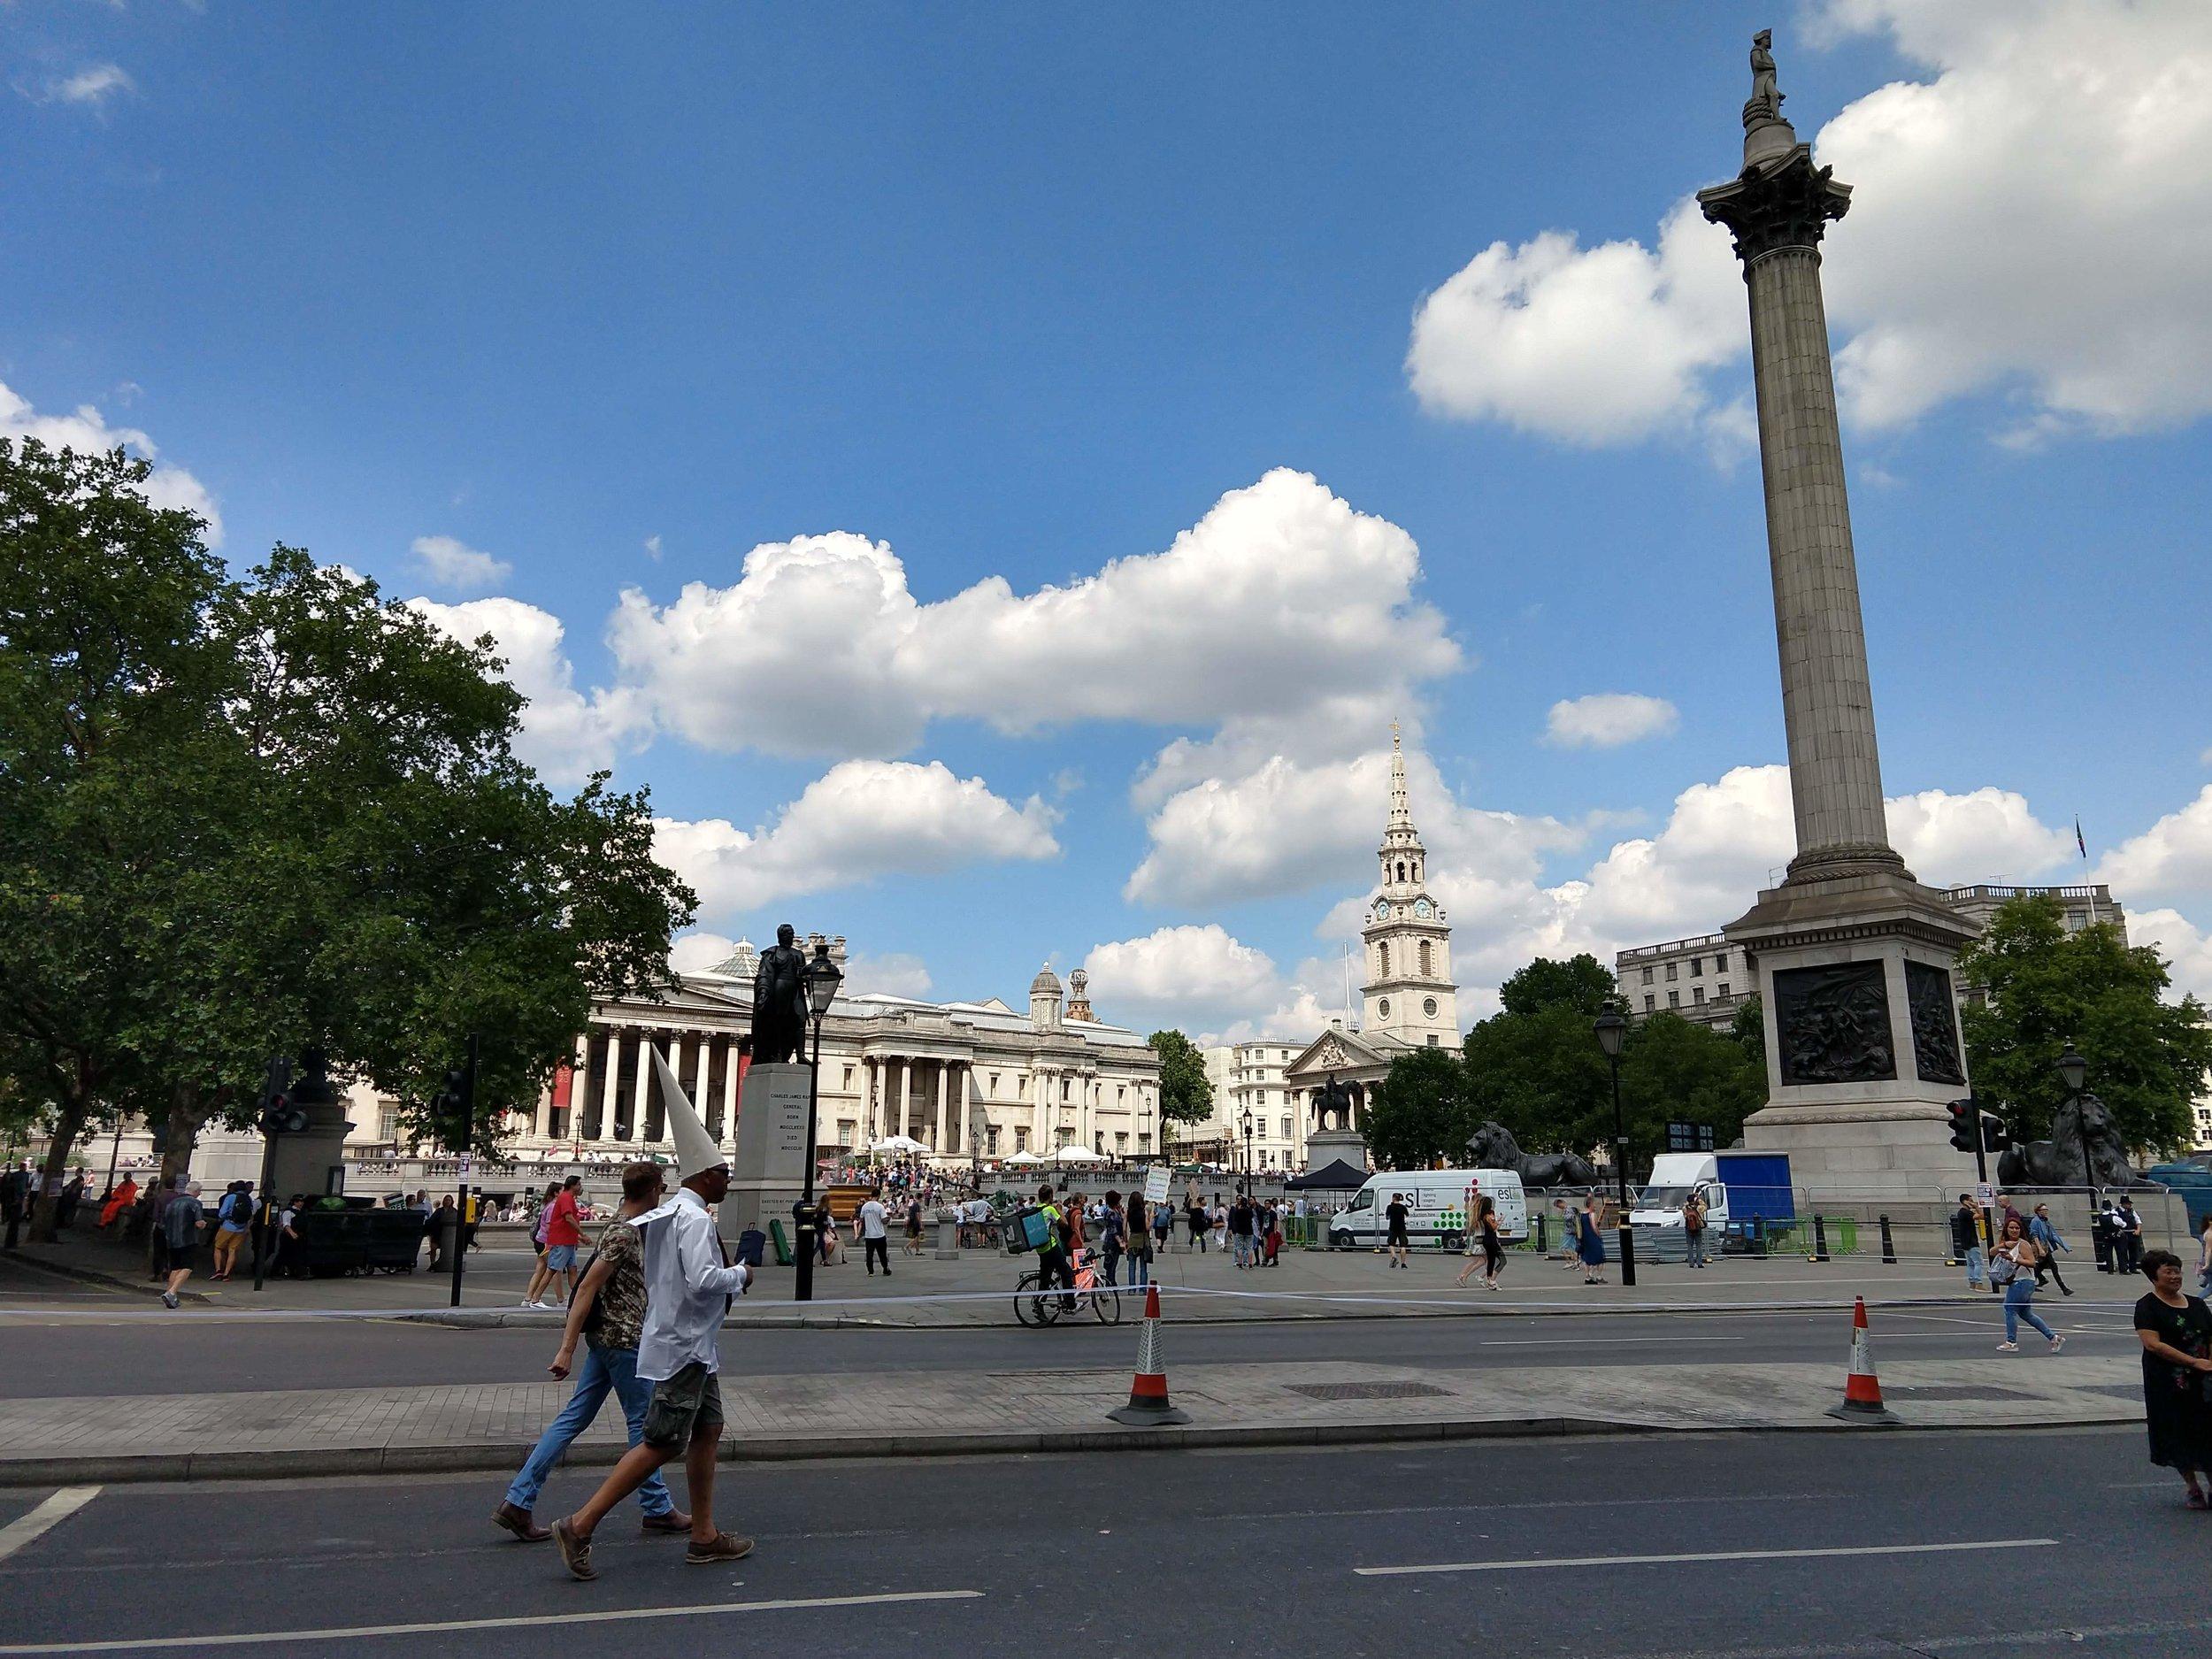 A man in a dunce cap walks past Trafalgar Square.